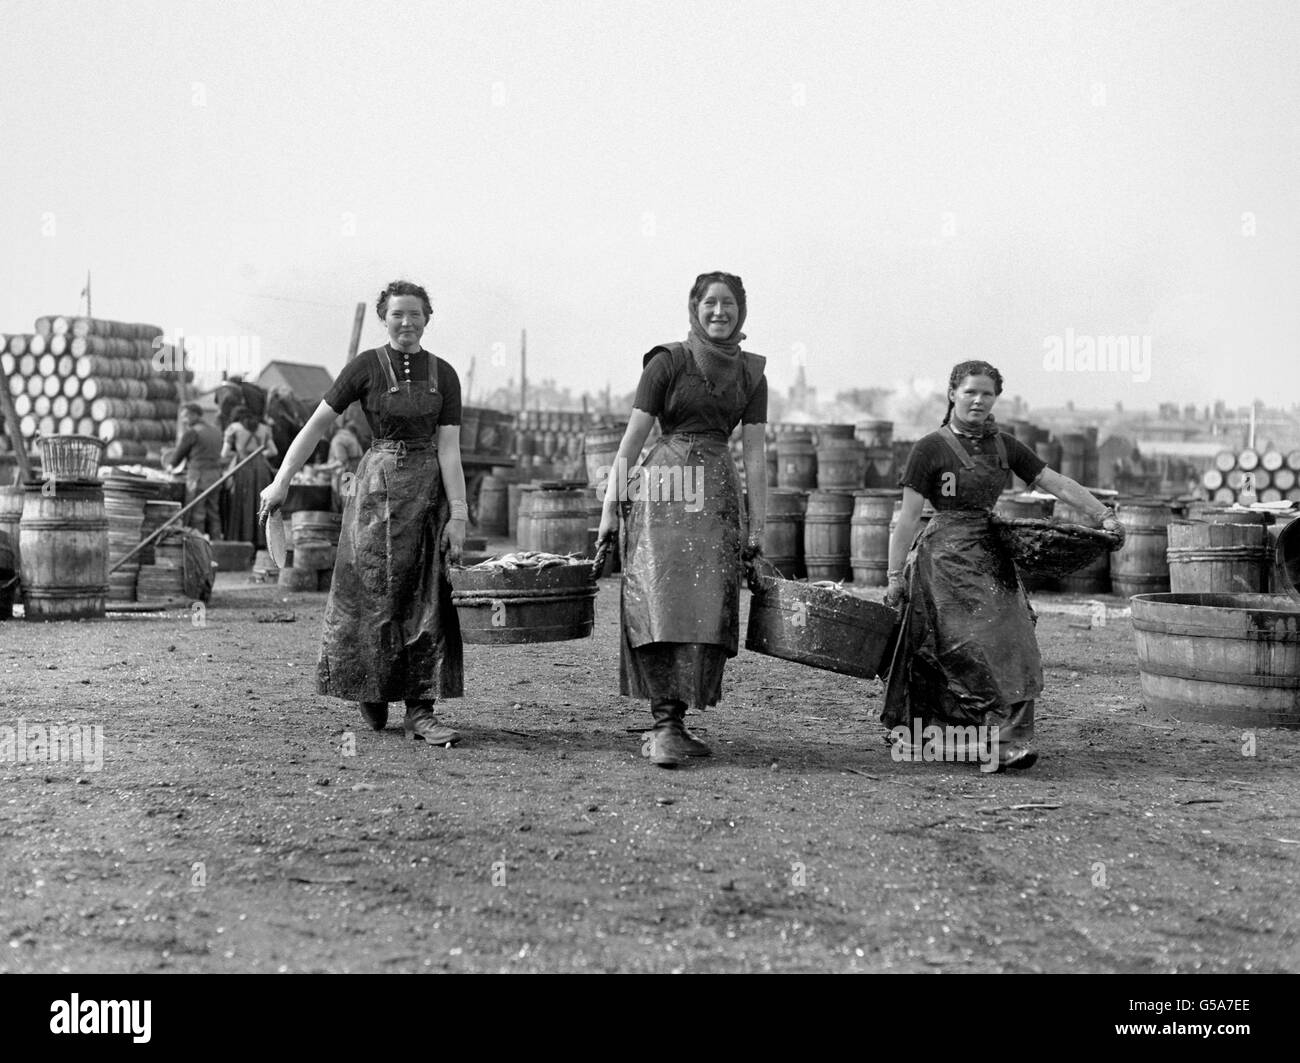 British Industry - Fishing - Herring Packing - Lowestoft - 1911 - Stock Image